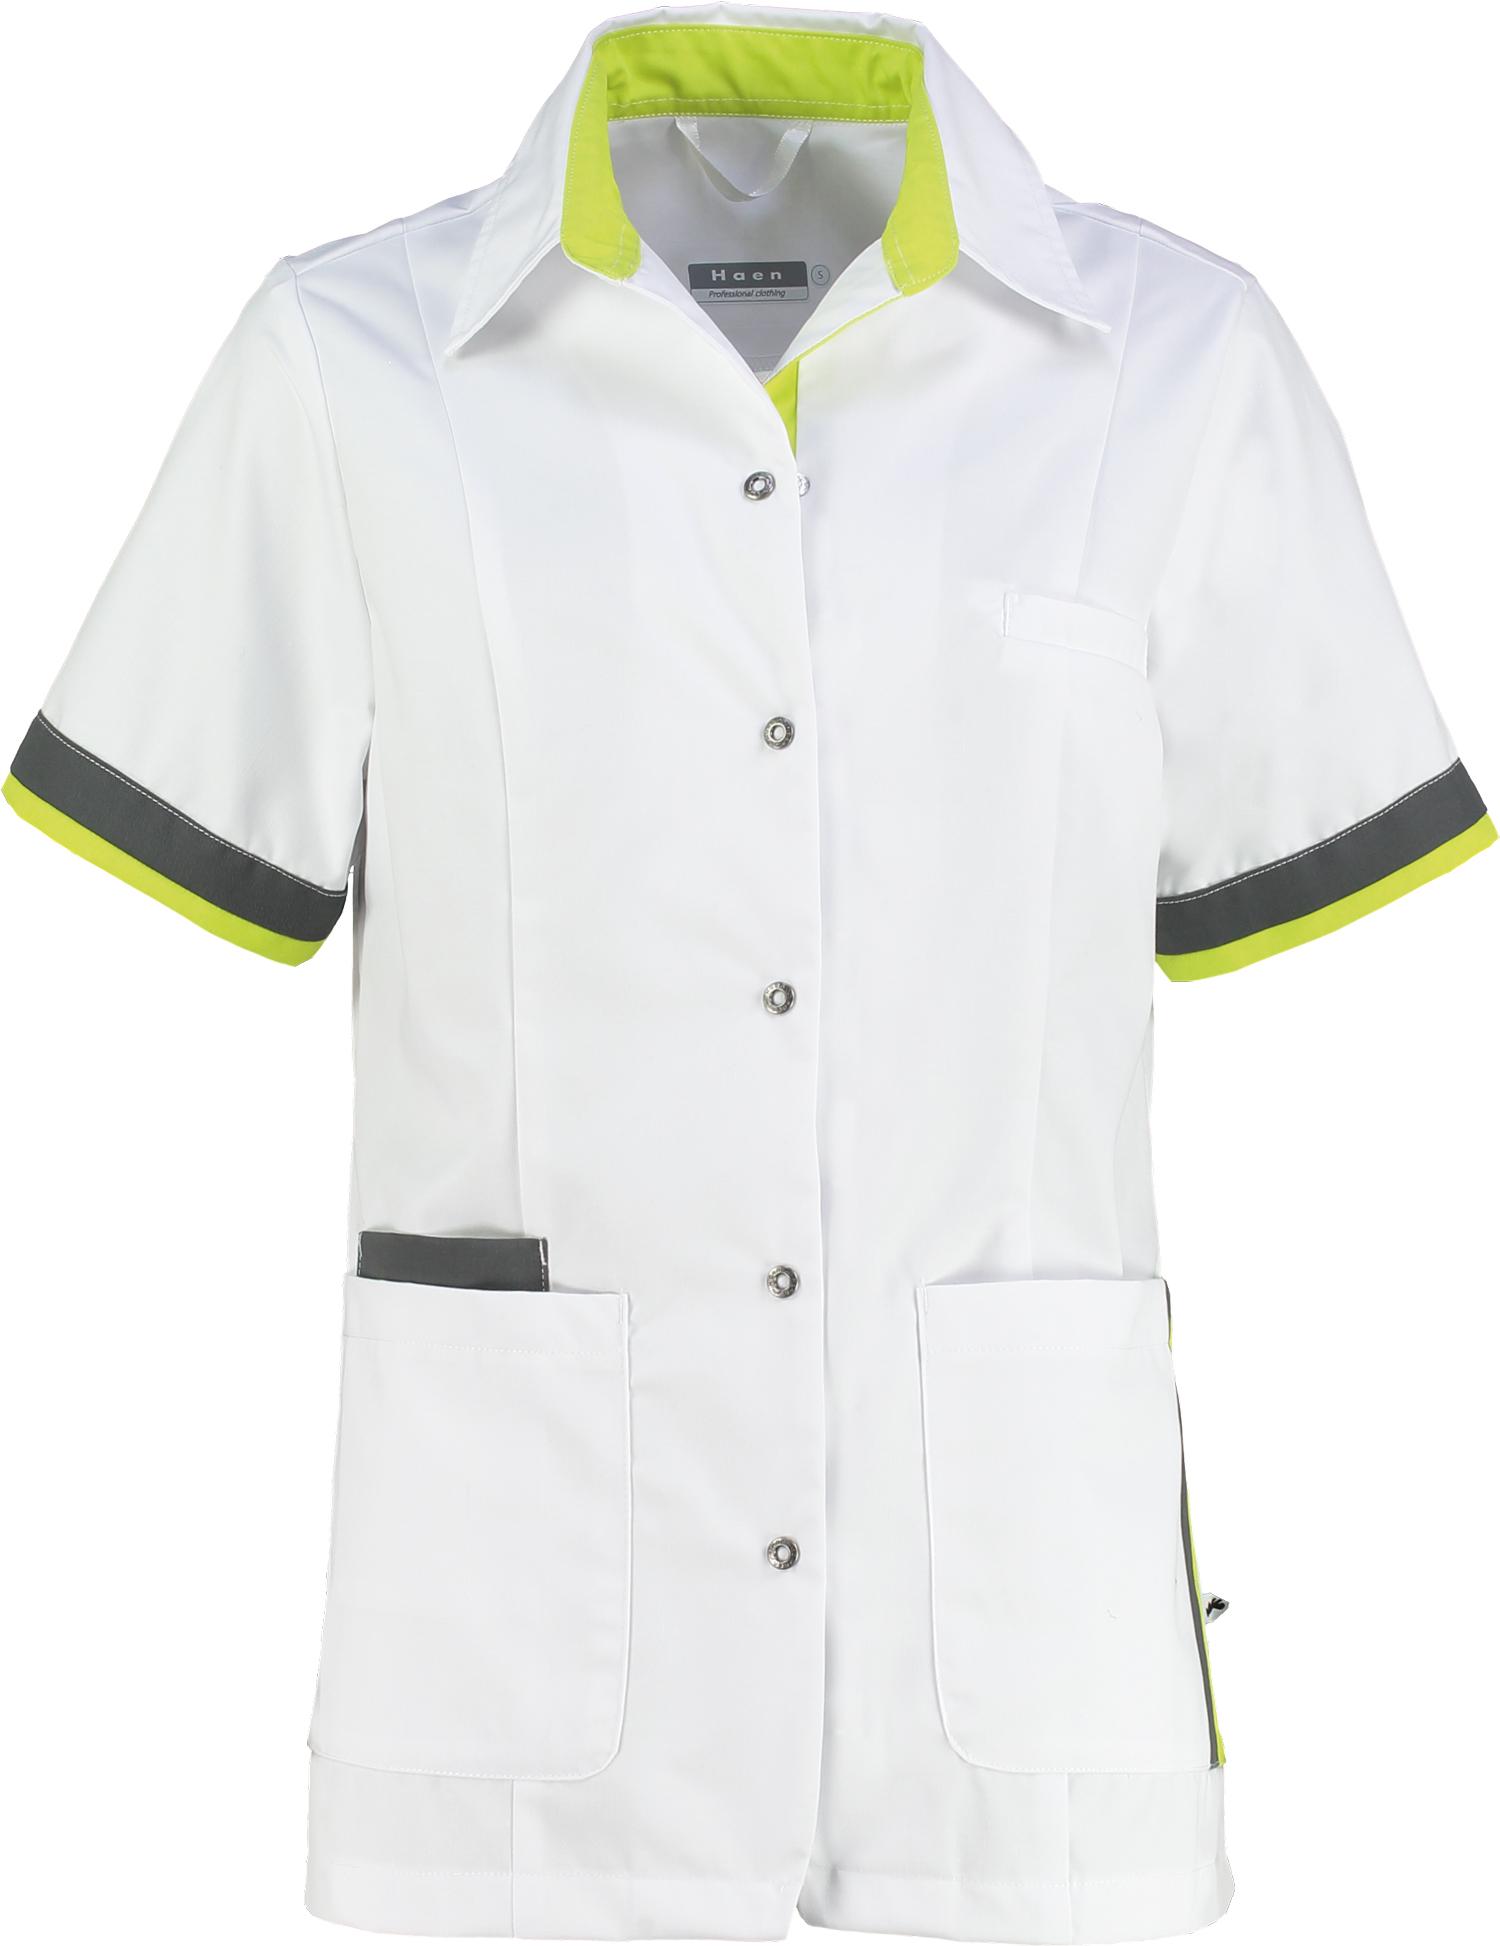 Haen Bente damesjasje Wit met sulfur yellow en charcoal contrast zorgkleding